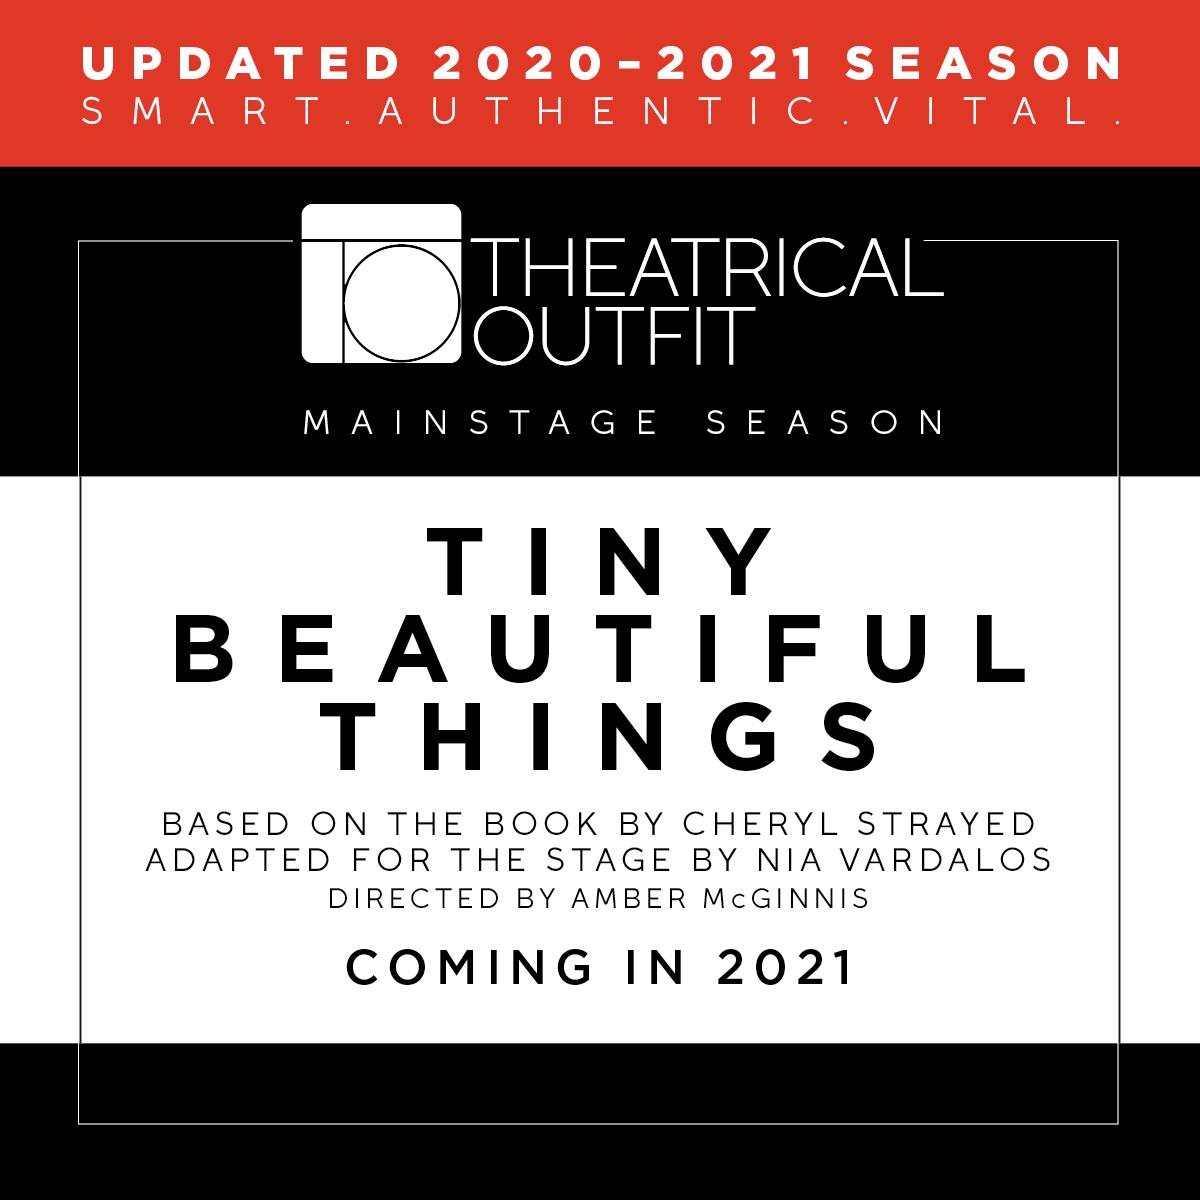 2020-21_TO_Season_SOCIAL_1200x1200_v1_MS-TinyBeautiful